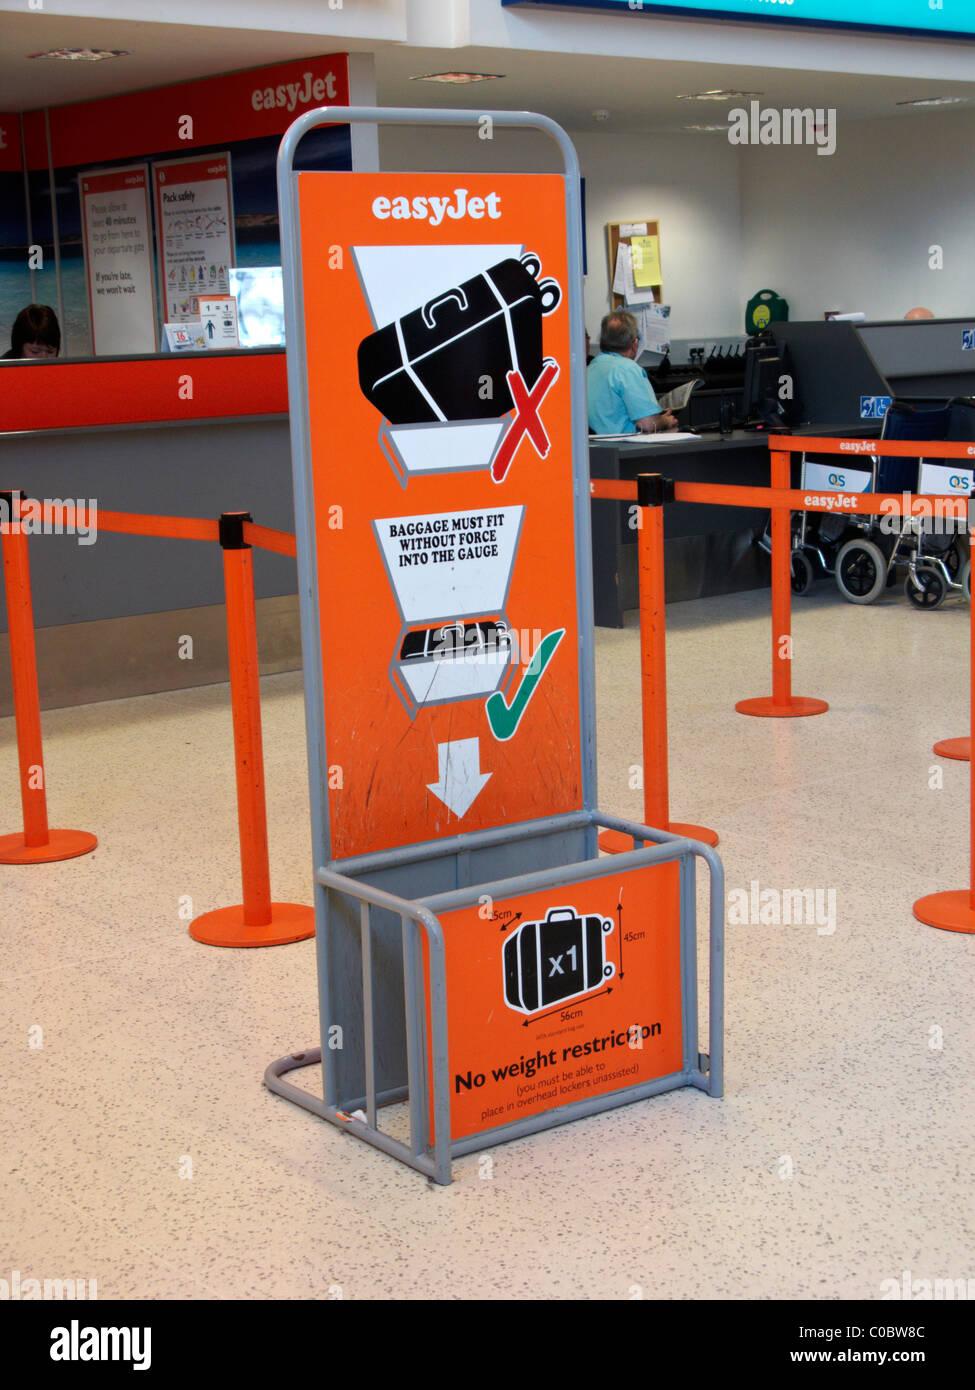 easyjet cabin baggage size gauge at Belfast International Airport Northern Ireland - Stock Image